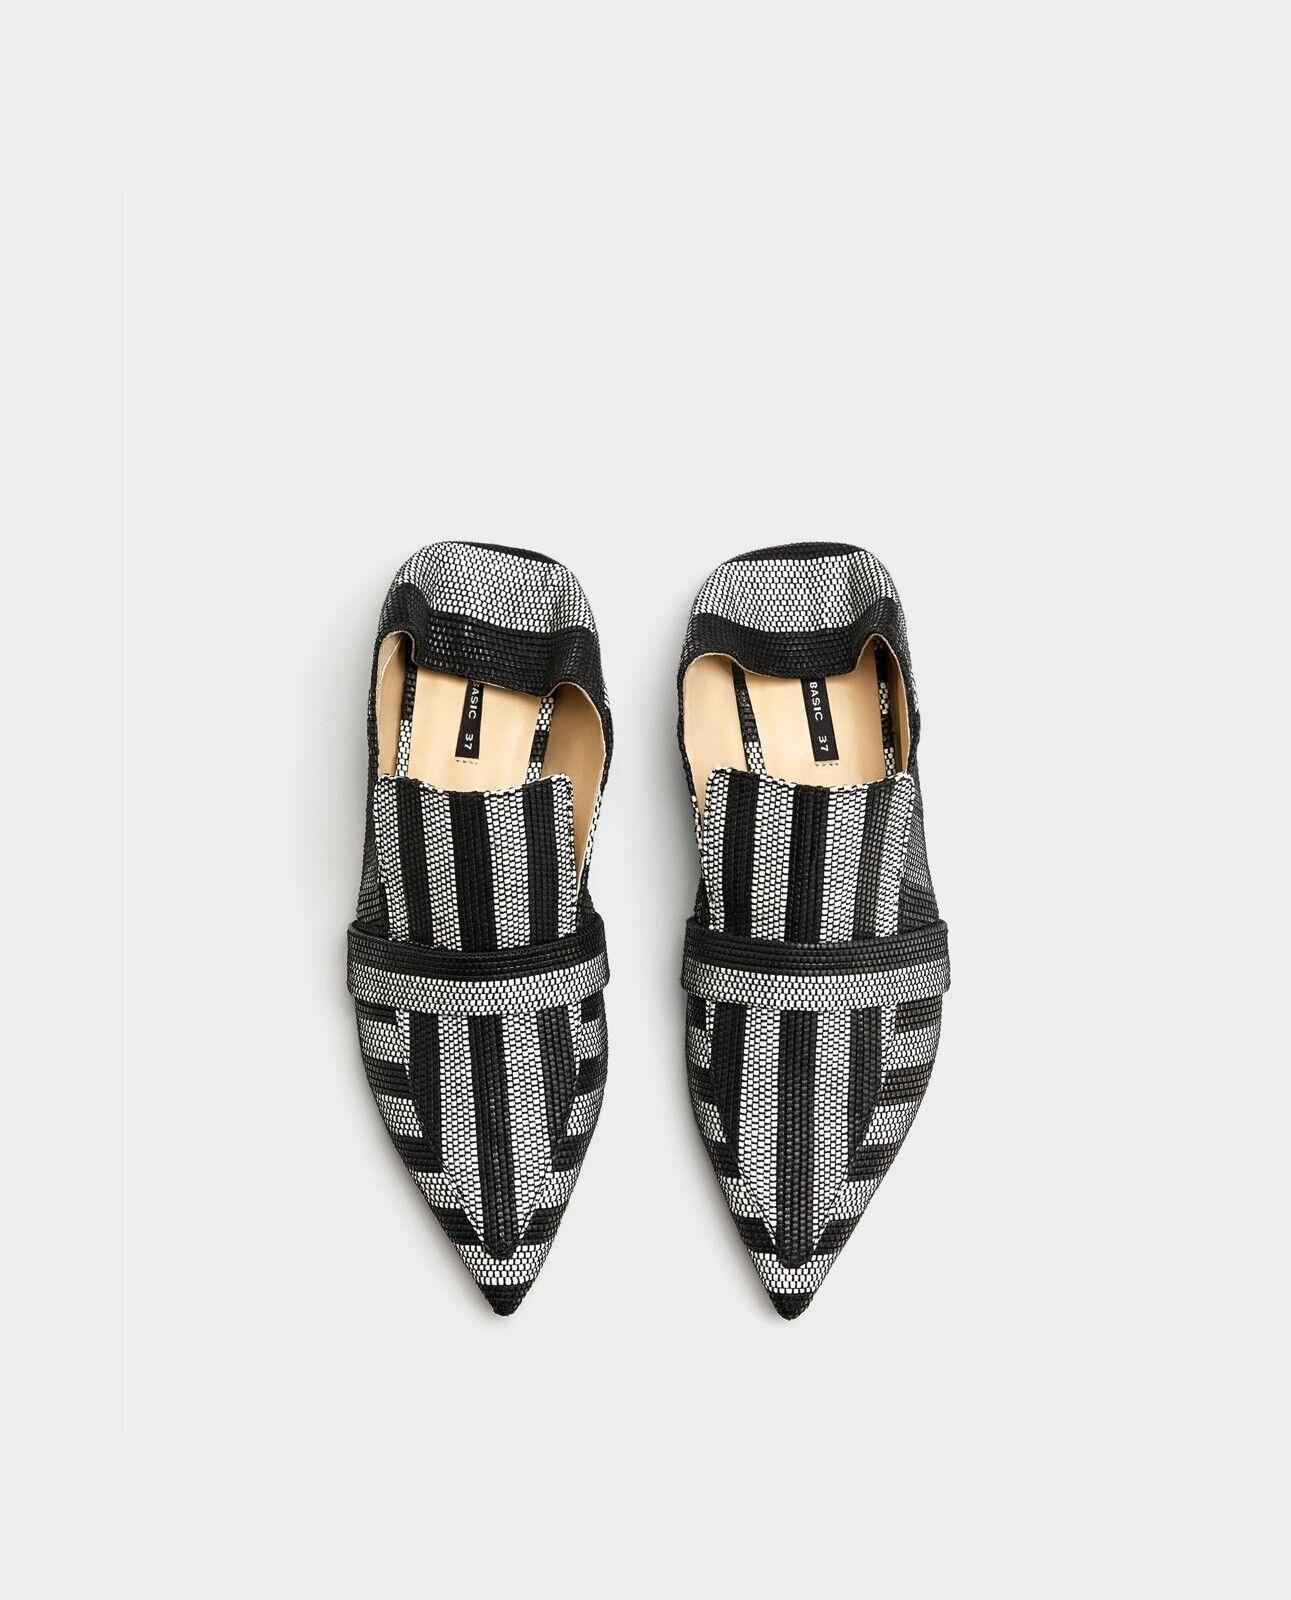 Zara Woman Striped Striped Striped Flat Mule Loafers 6436 201 Size 8 NWT 616124